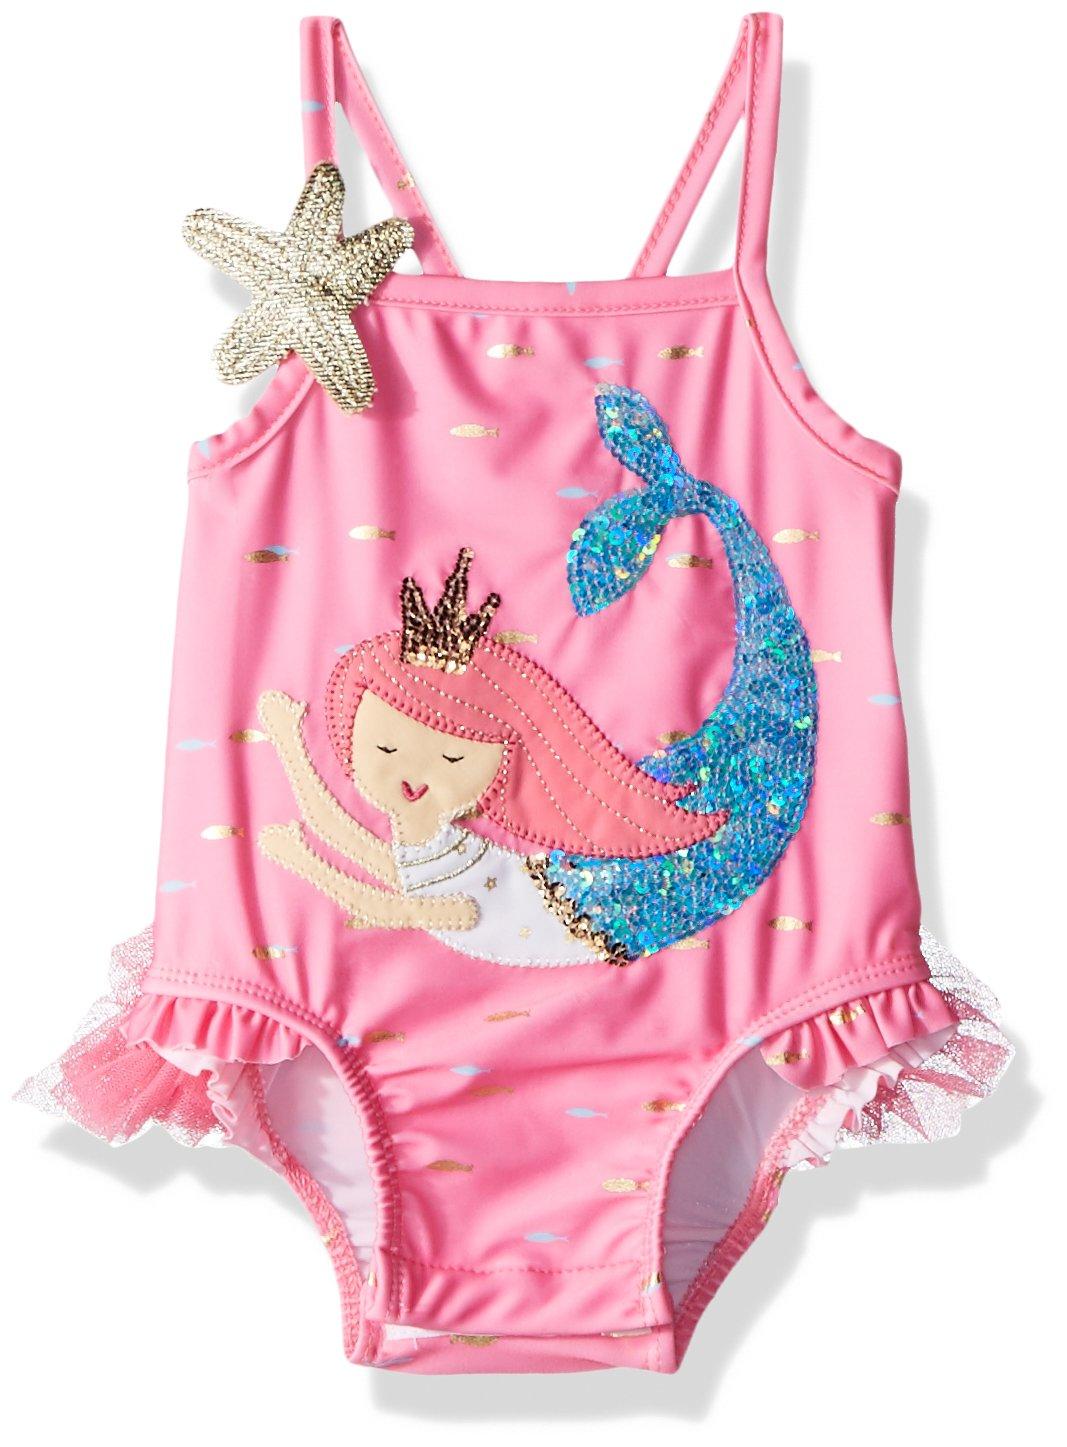 Mud Pie Girls' Baby Mermaid Ruffle One Piece Swimsuit, Pink, 2T by Mud Pie